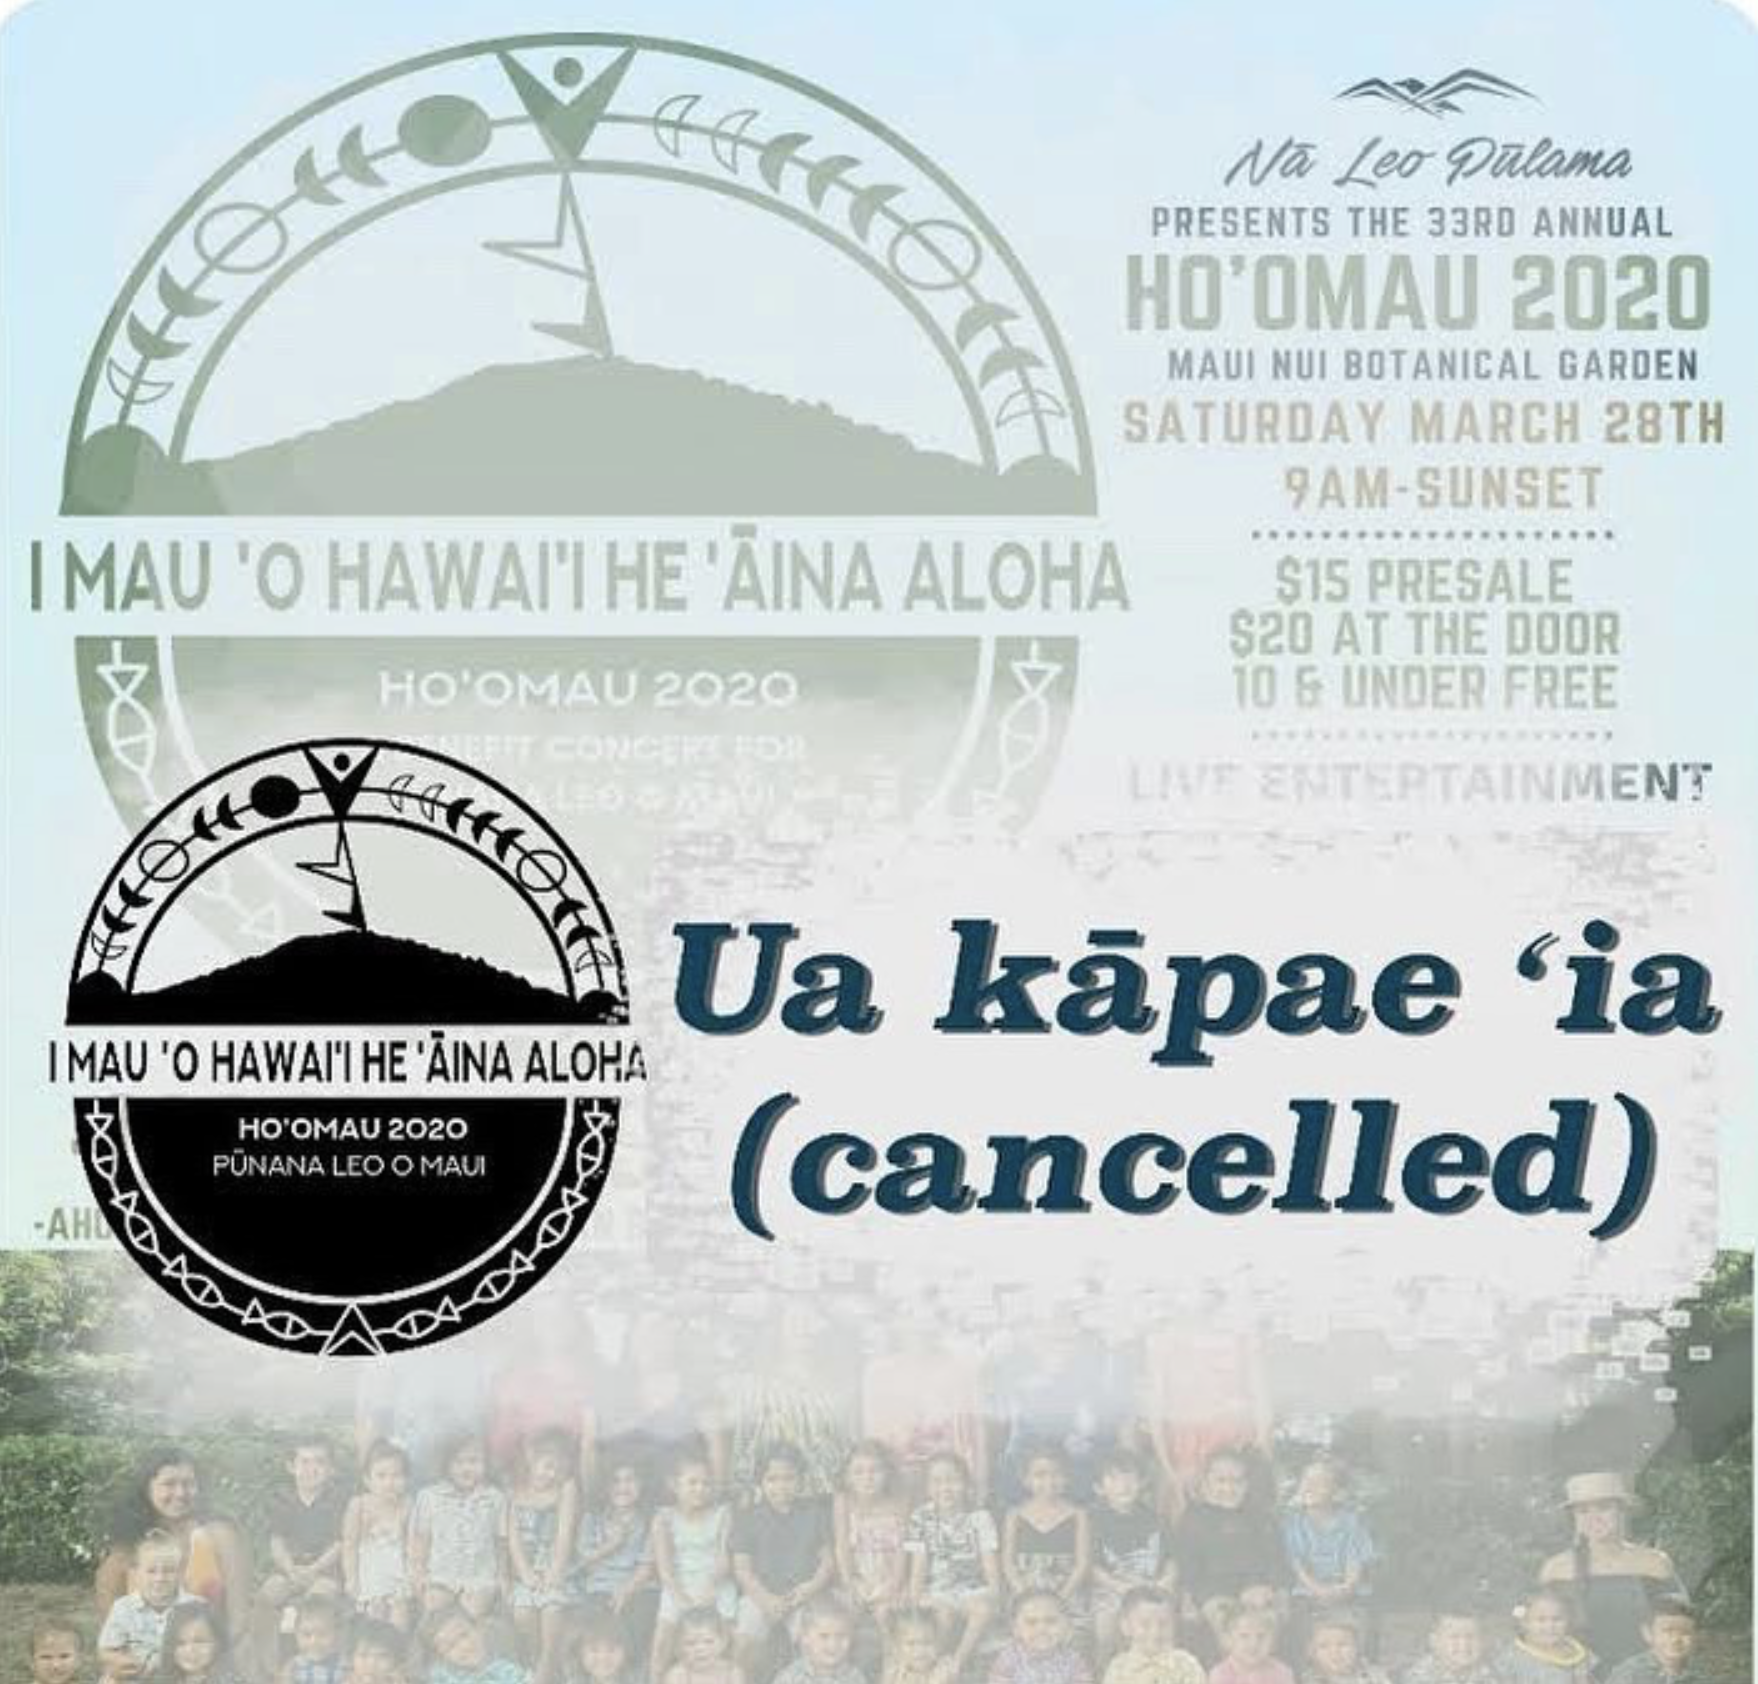 33rd Annual Ho'omau for 2020 Canceled